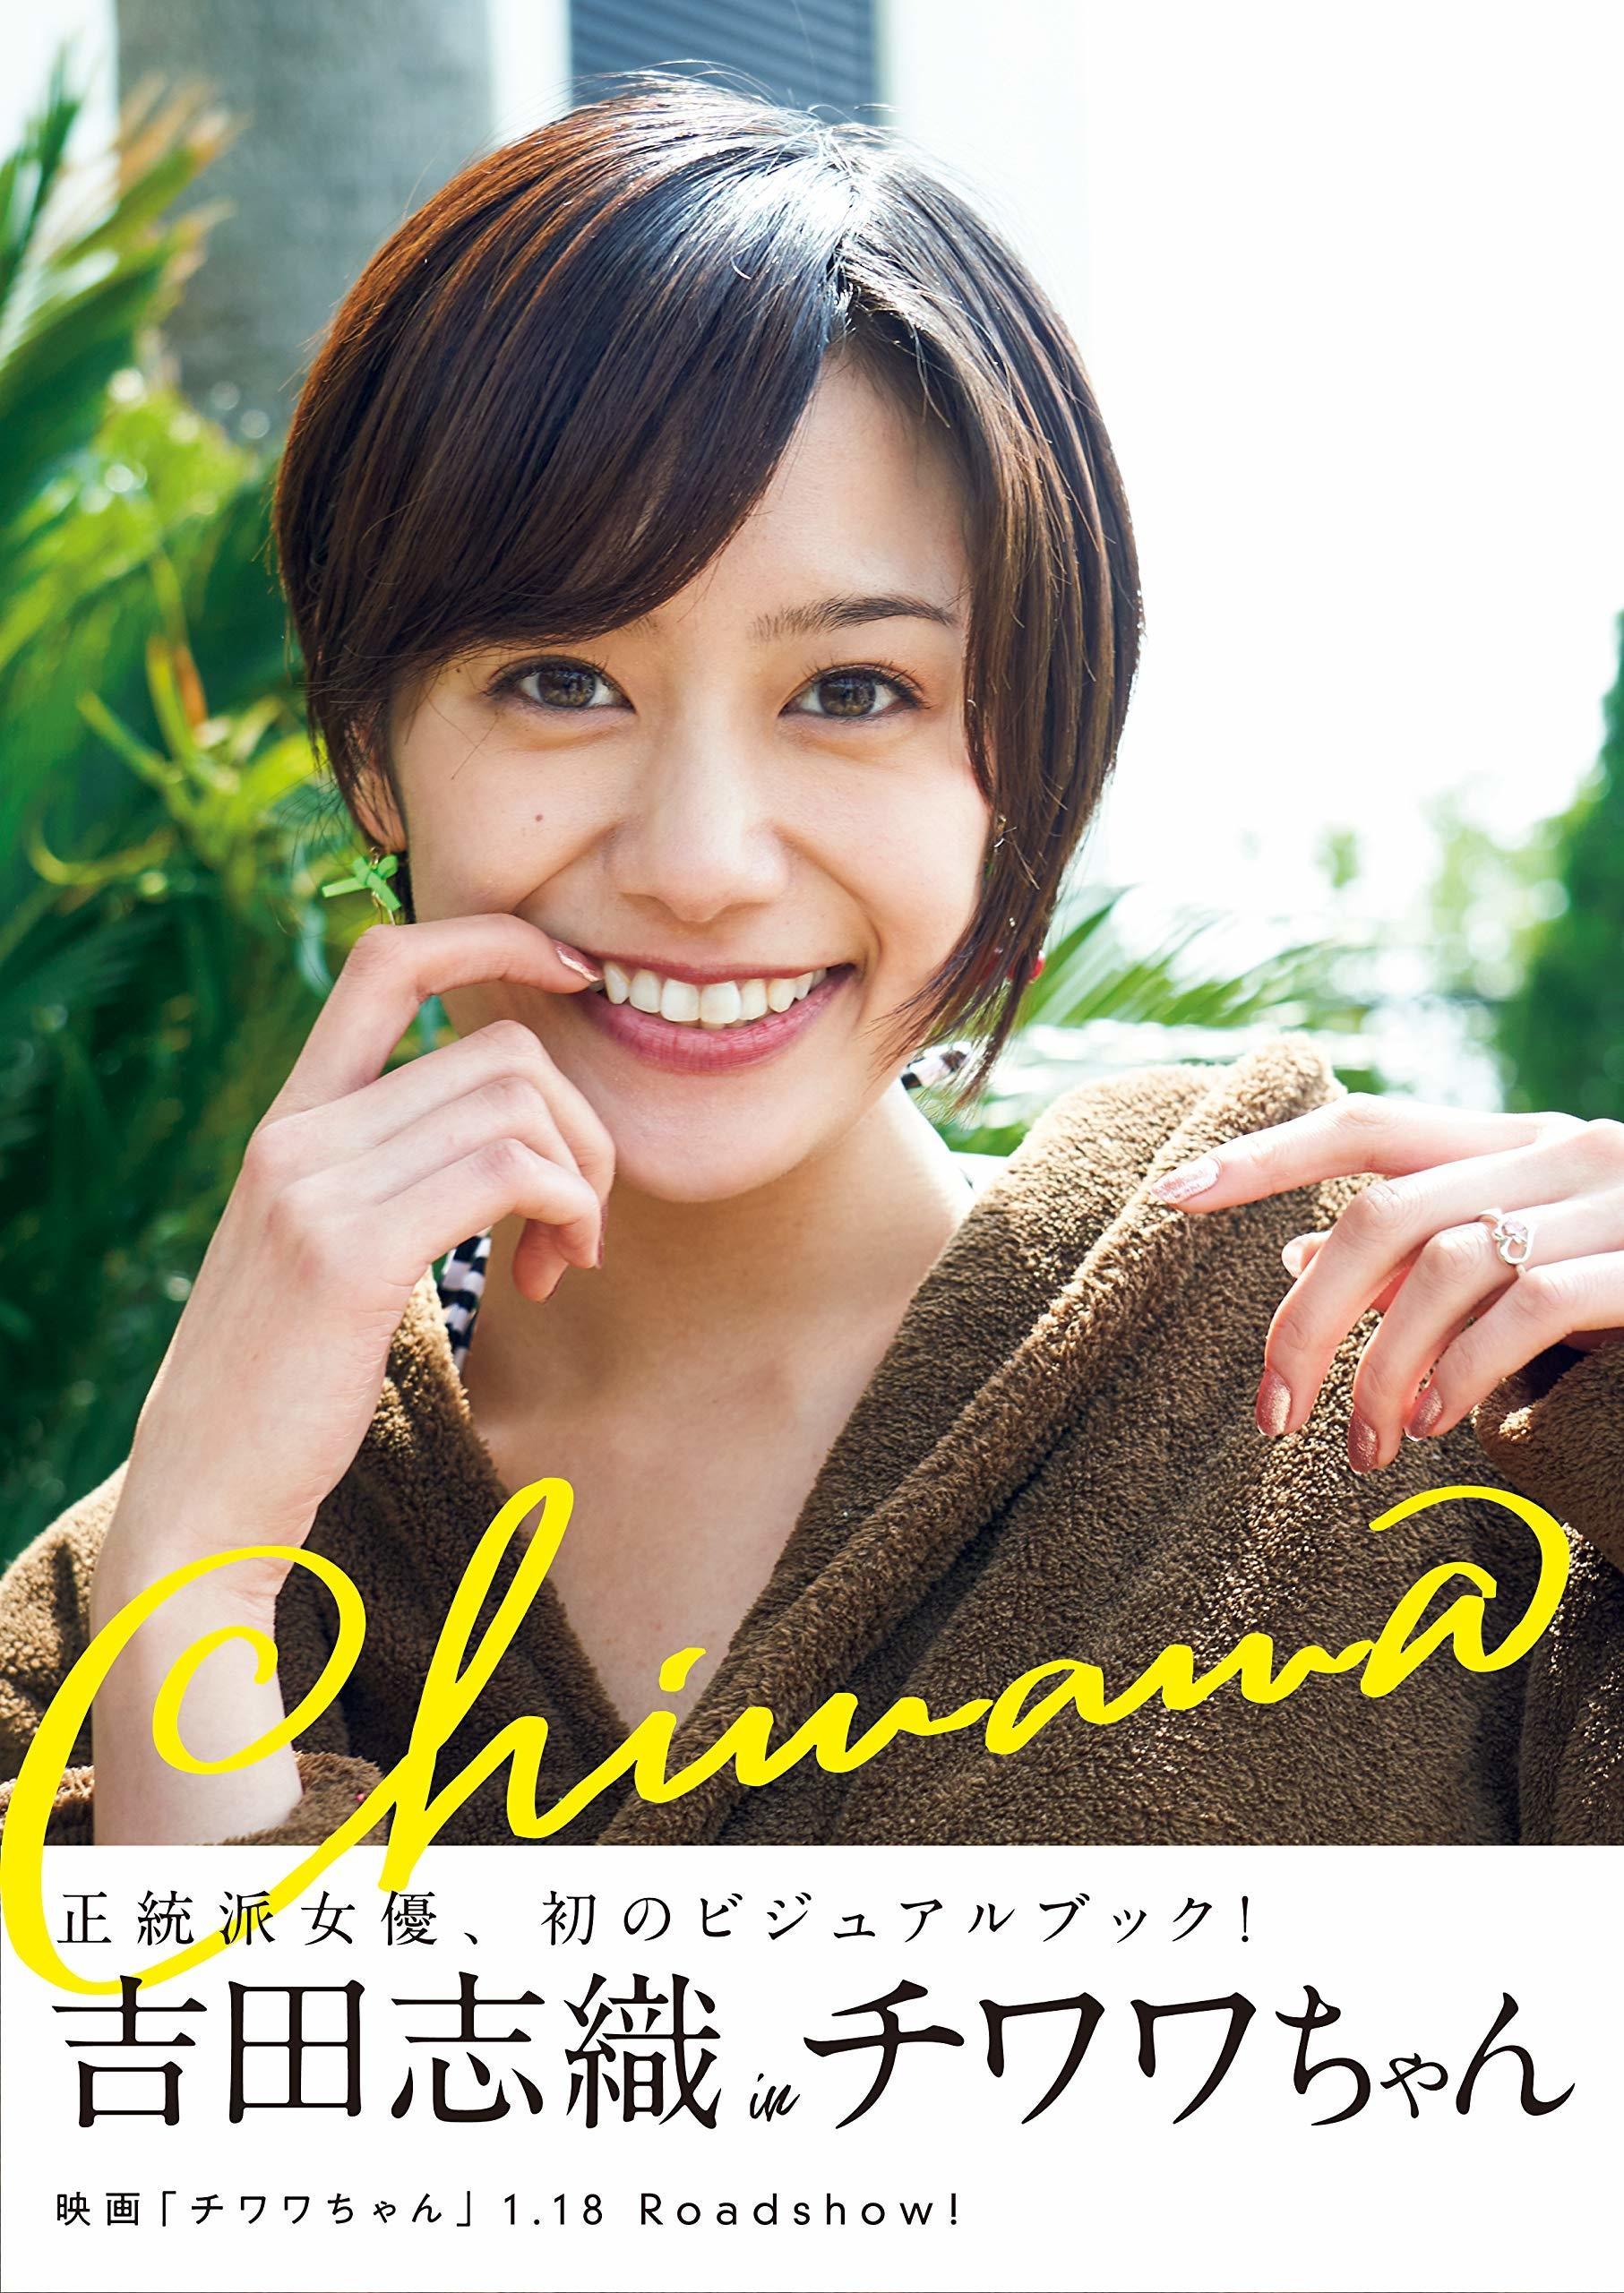 about チワワちゃん